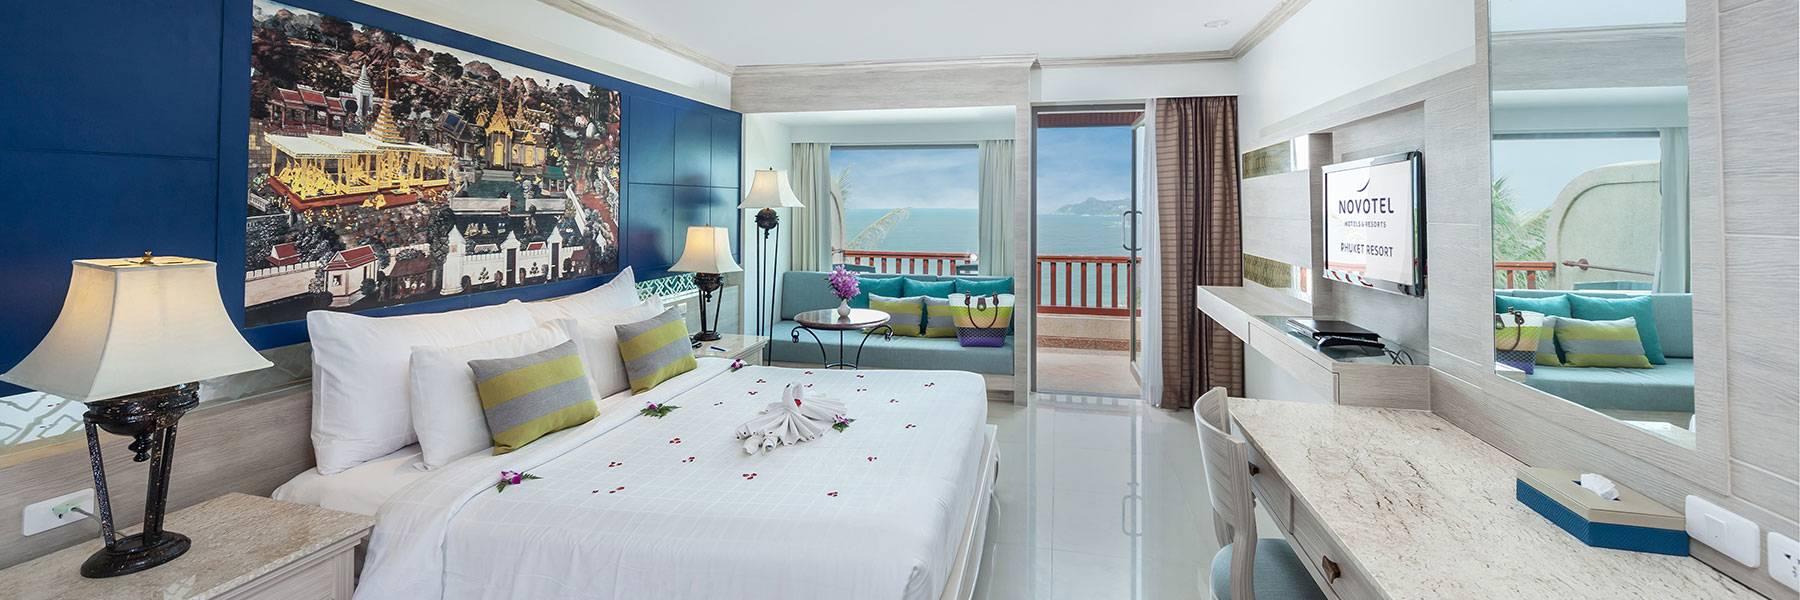 Novotel Phuket Resort Guest Rooms